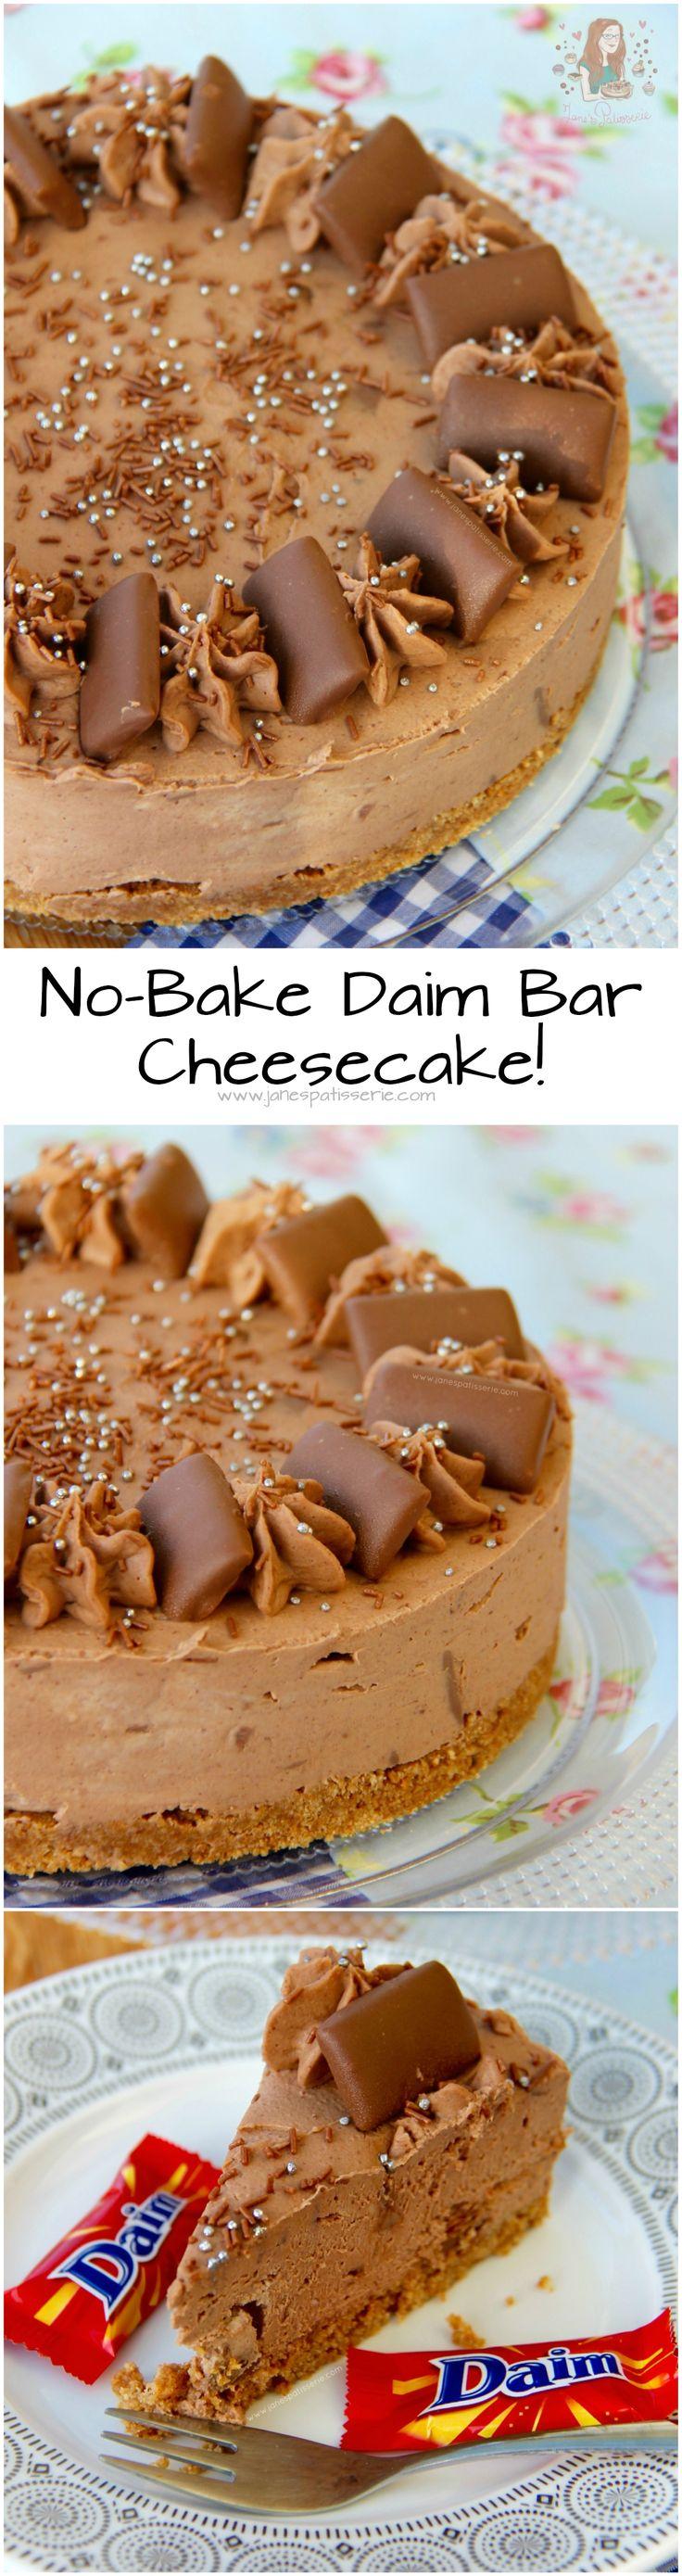 No-Bake Daim Bar Cheesecake! ❤️ A Chocolatey, Caramelly & Almond No-Bake…